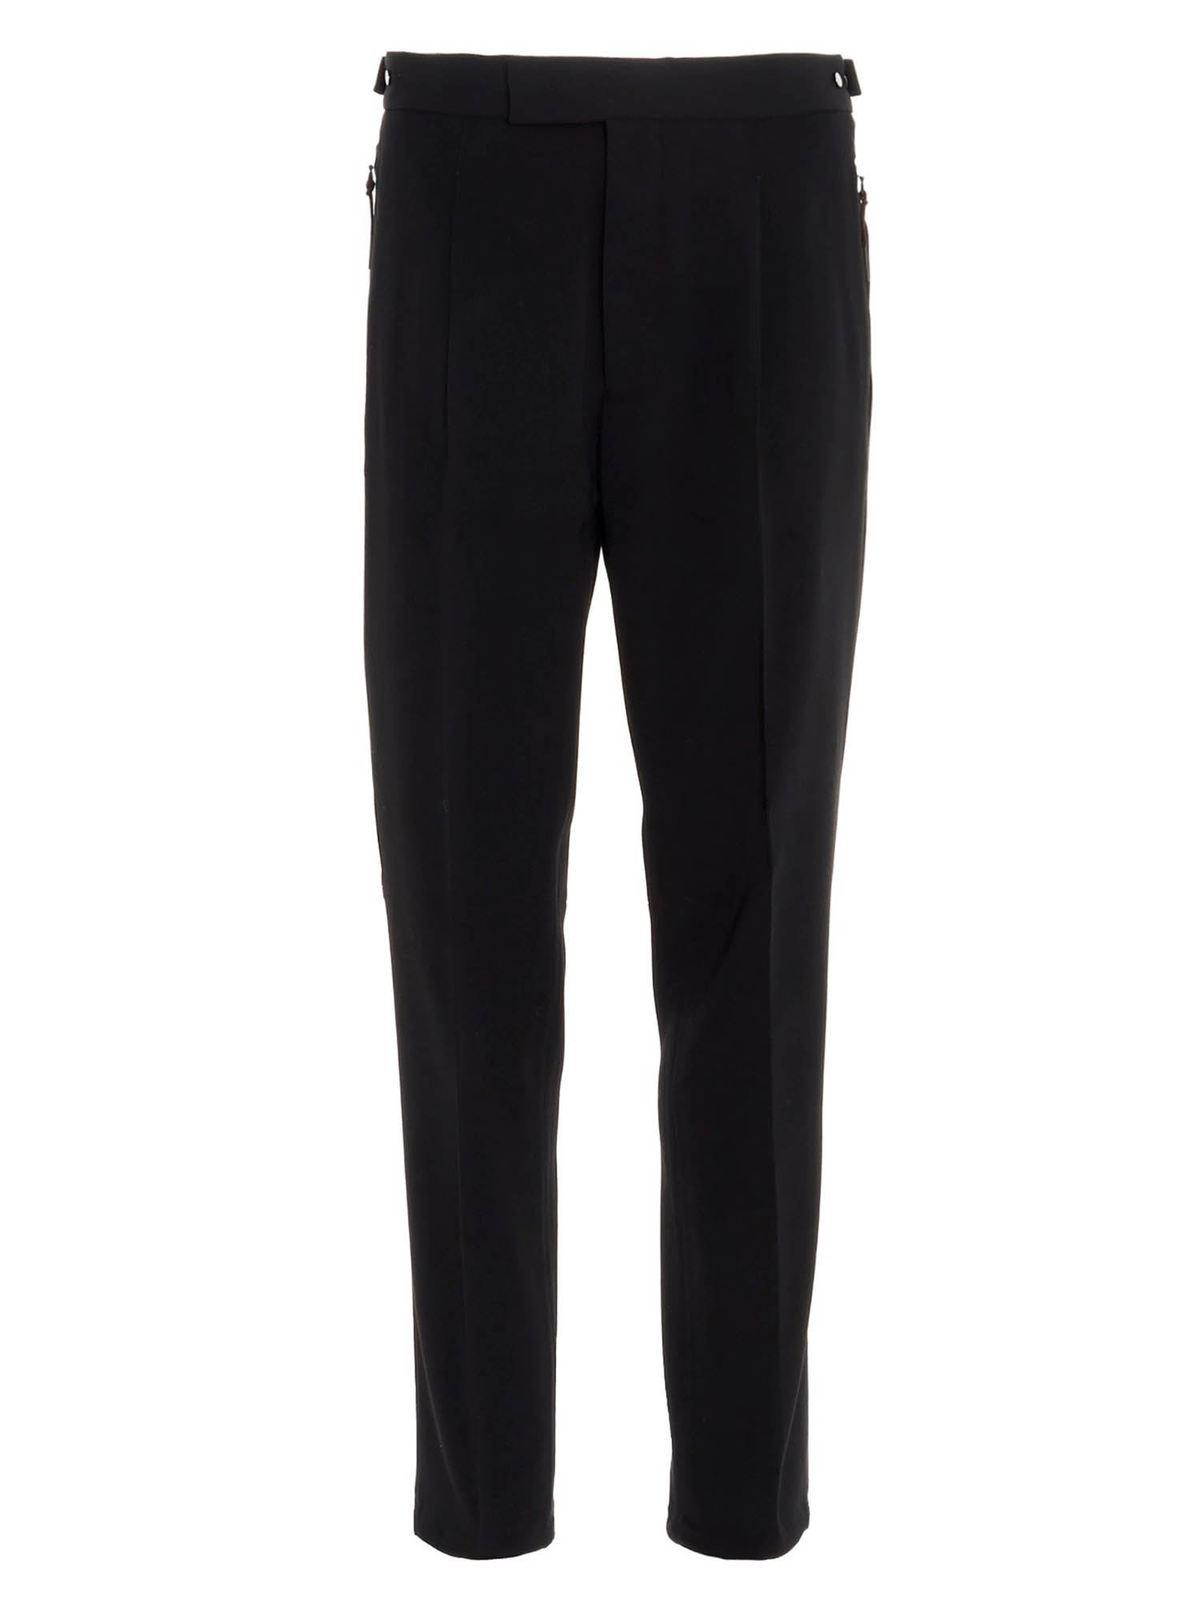 Ermenegildo Zegna Pants CLASSIC URBAN PANTS IN BLACK